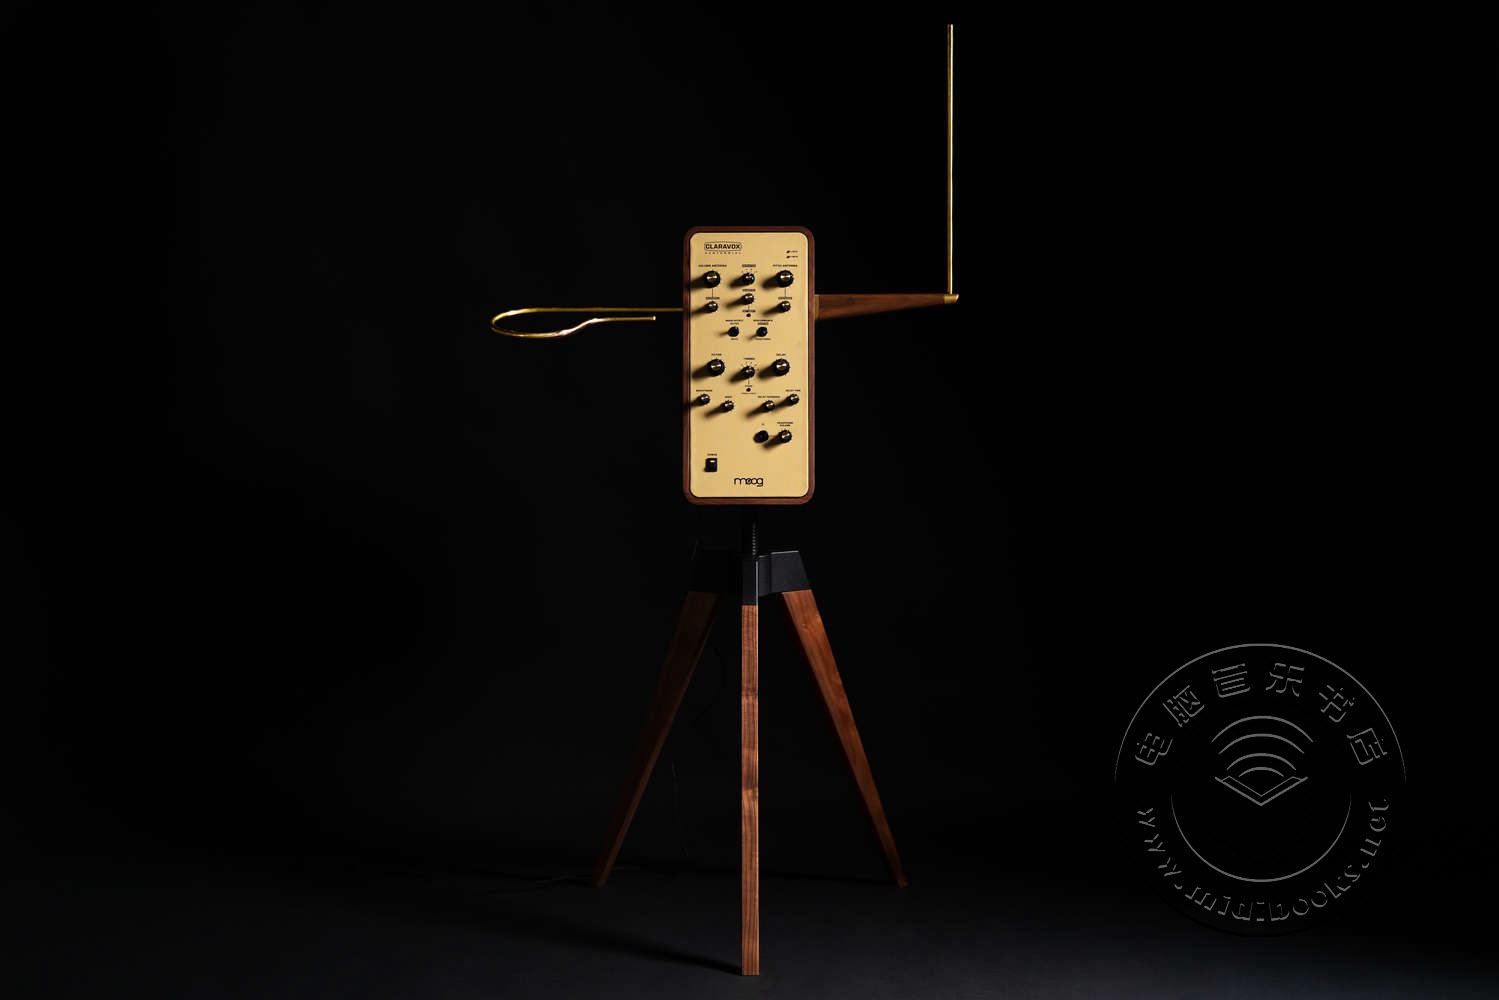 Moog发布百年纪念限量版Theremin乐器,一种无需接触即可演奏的神奇乐器(视频)